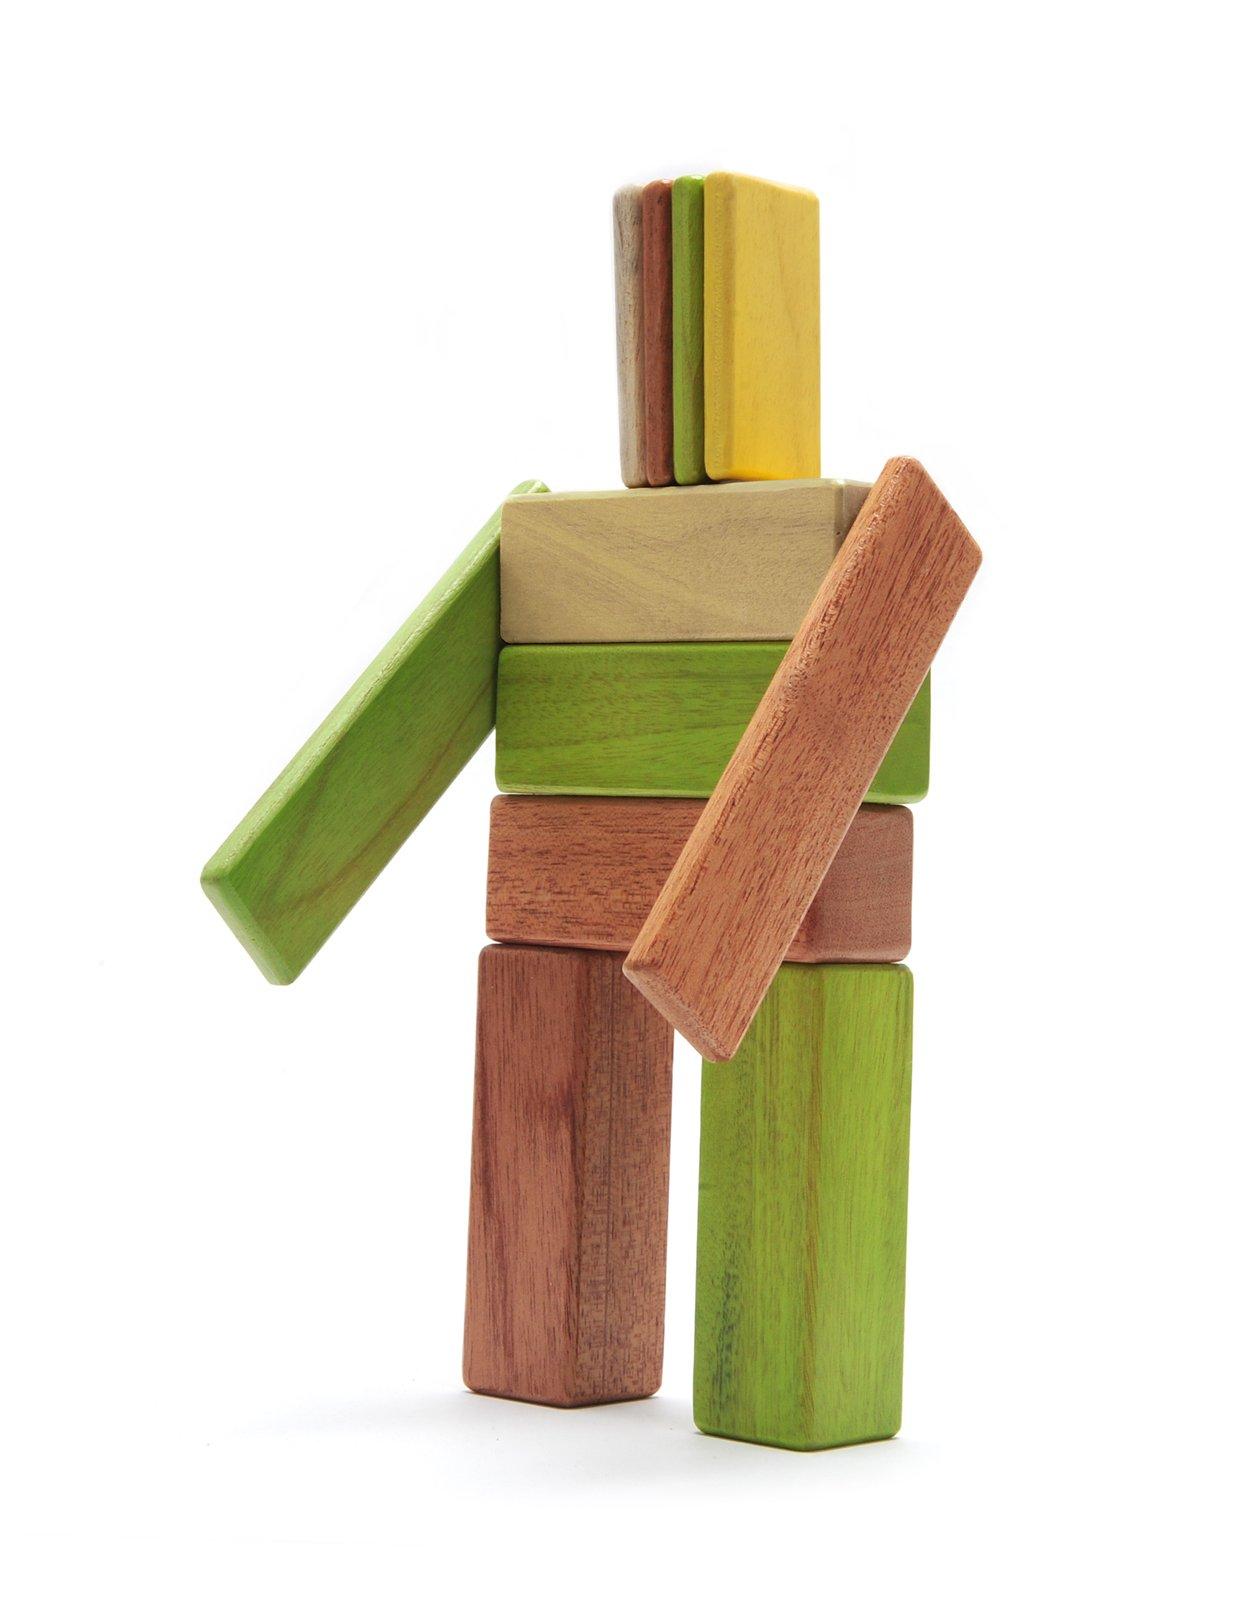 22 Piece Tegu Endeavor Magnetic Wooden Block Set, Jungle by Tegu (Image #5)